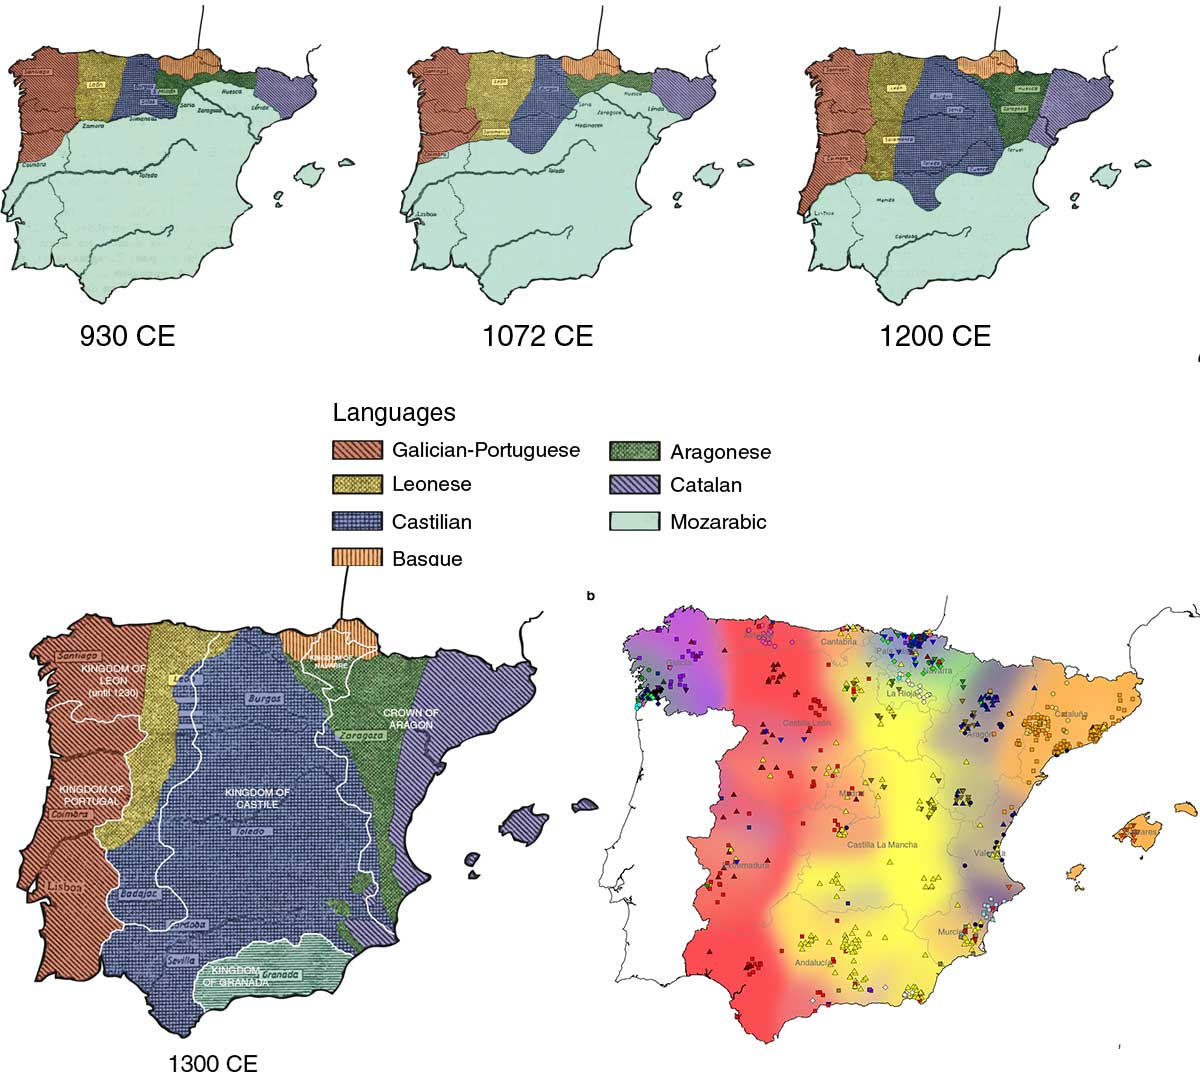 iberian-medieval-kingdoms-expansion-population-genomics